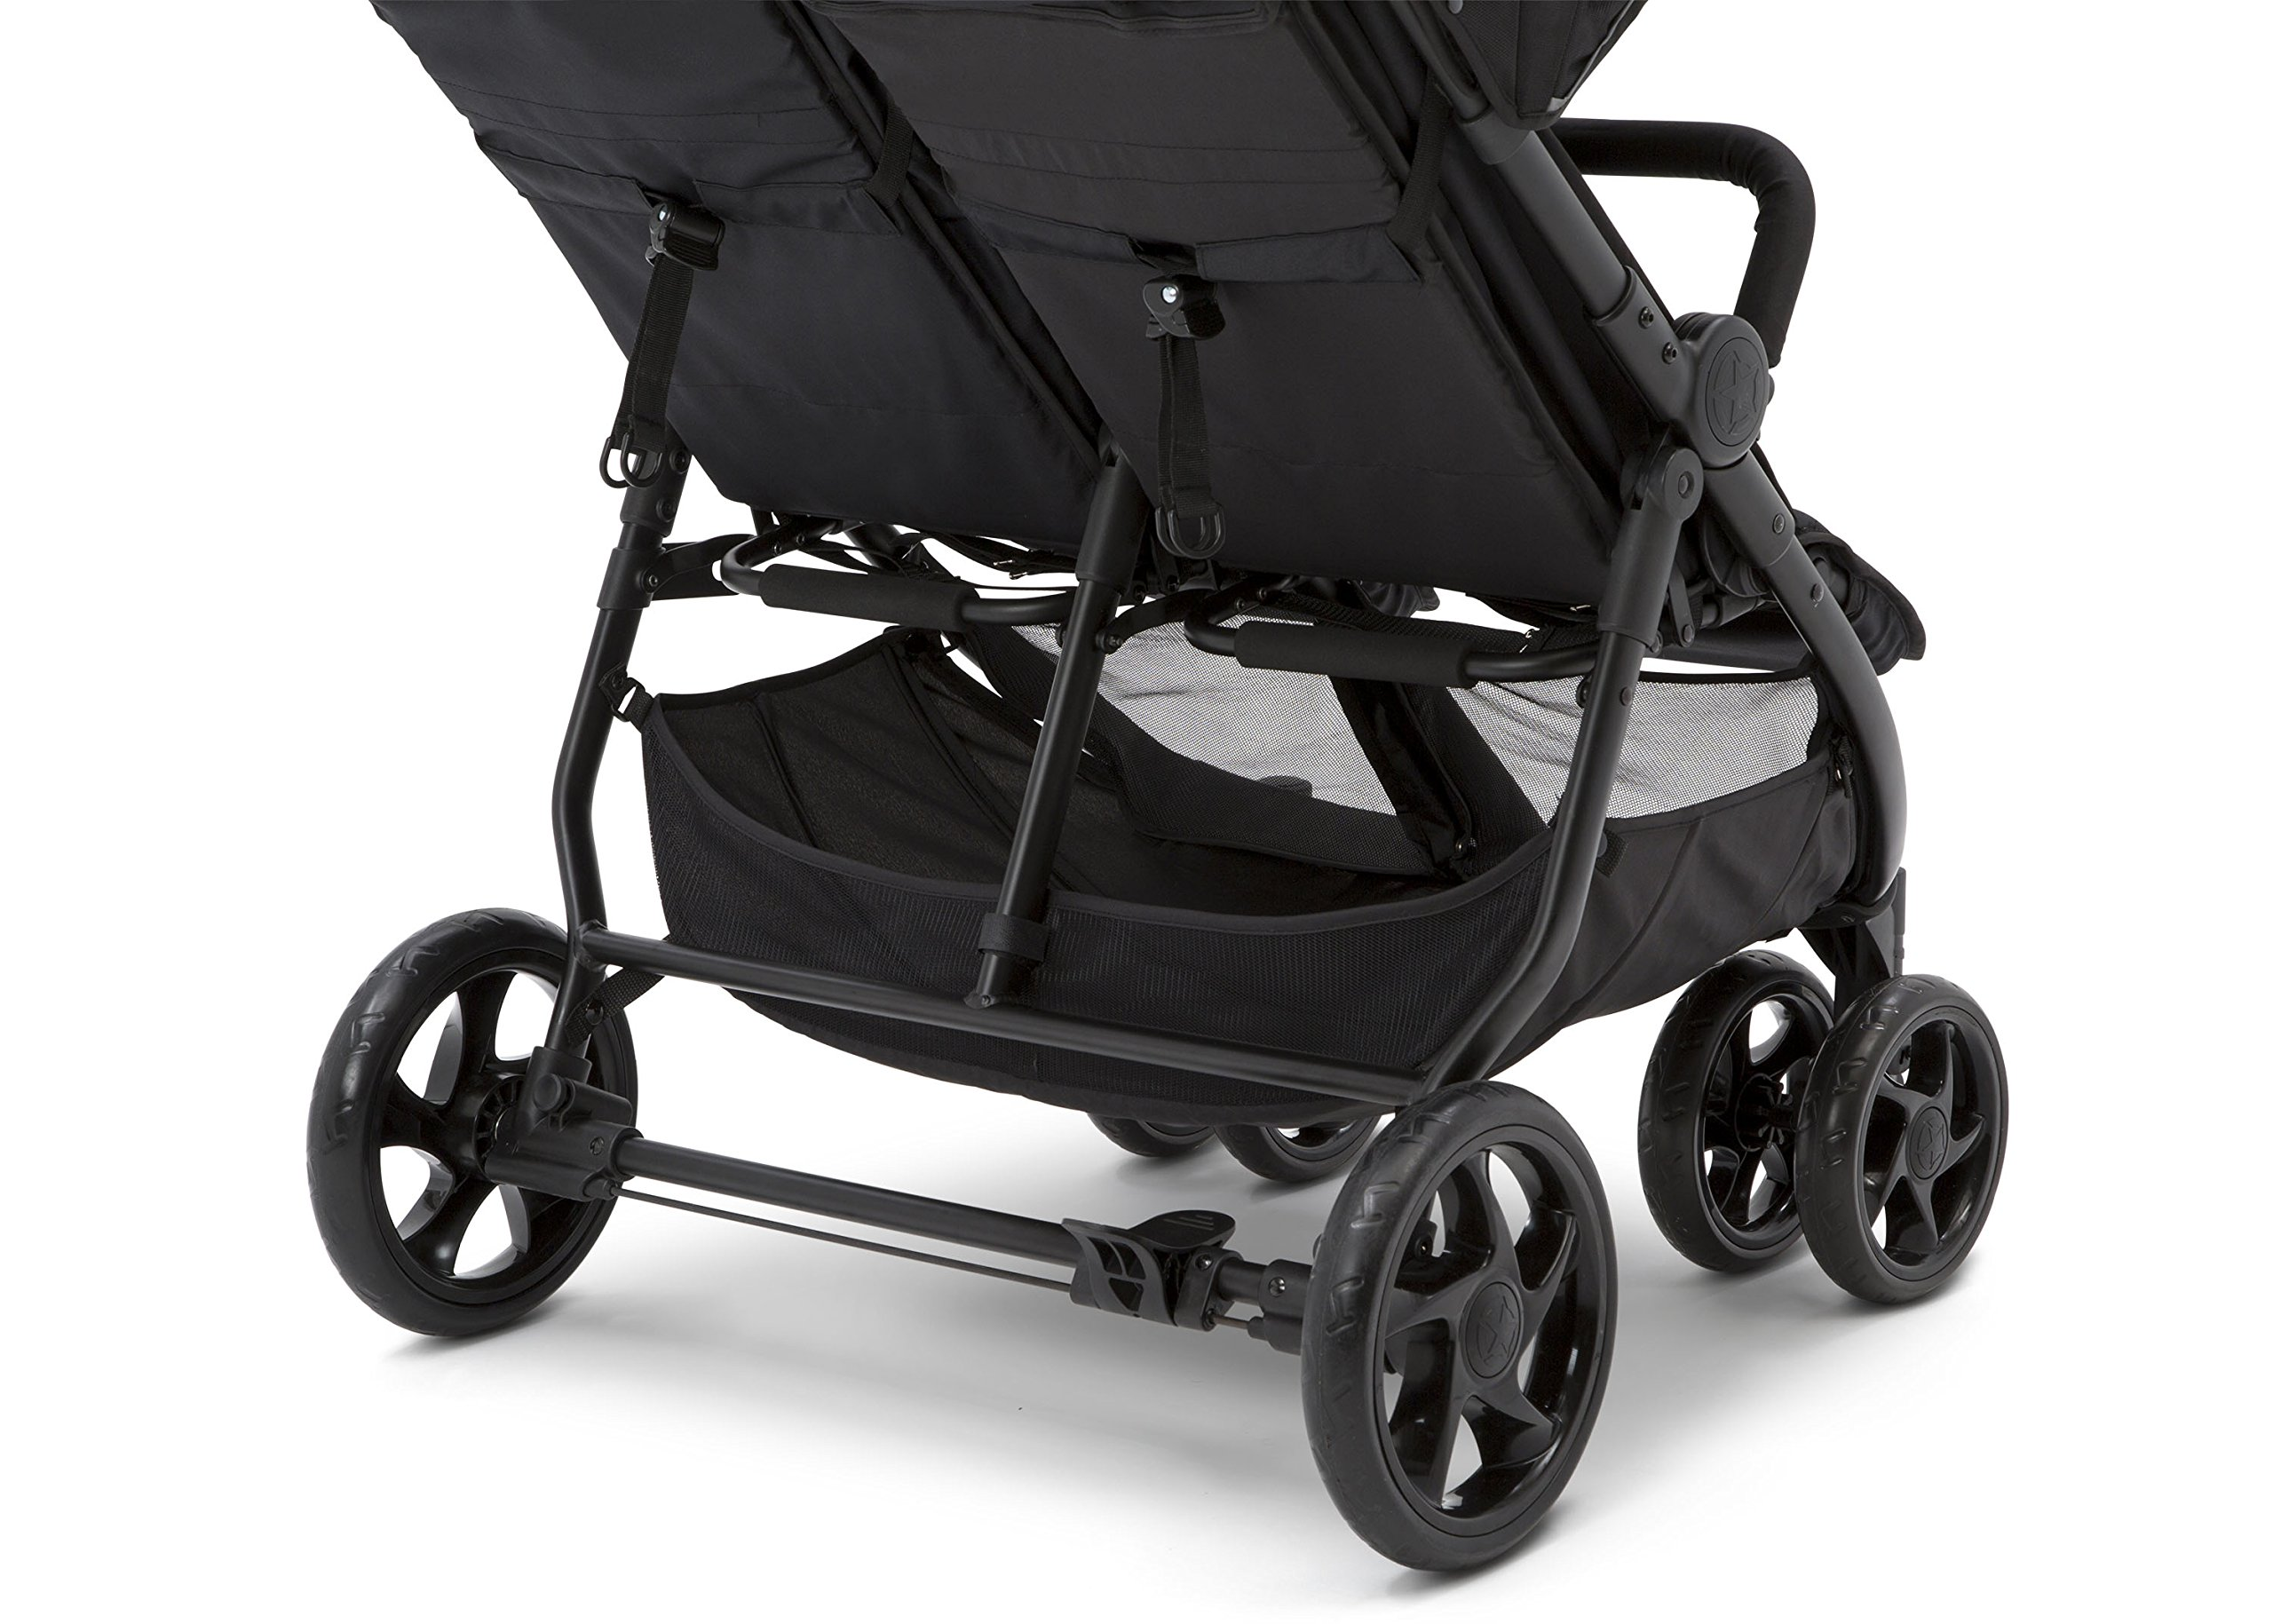 Jeep Destination Ultralight Side x Side Double Stroller, Midnight (Black) by Delta Children (Image #7)